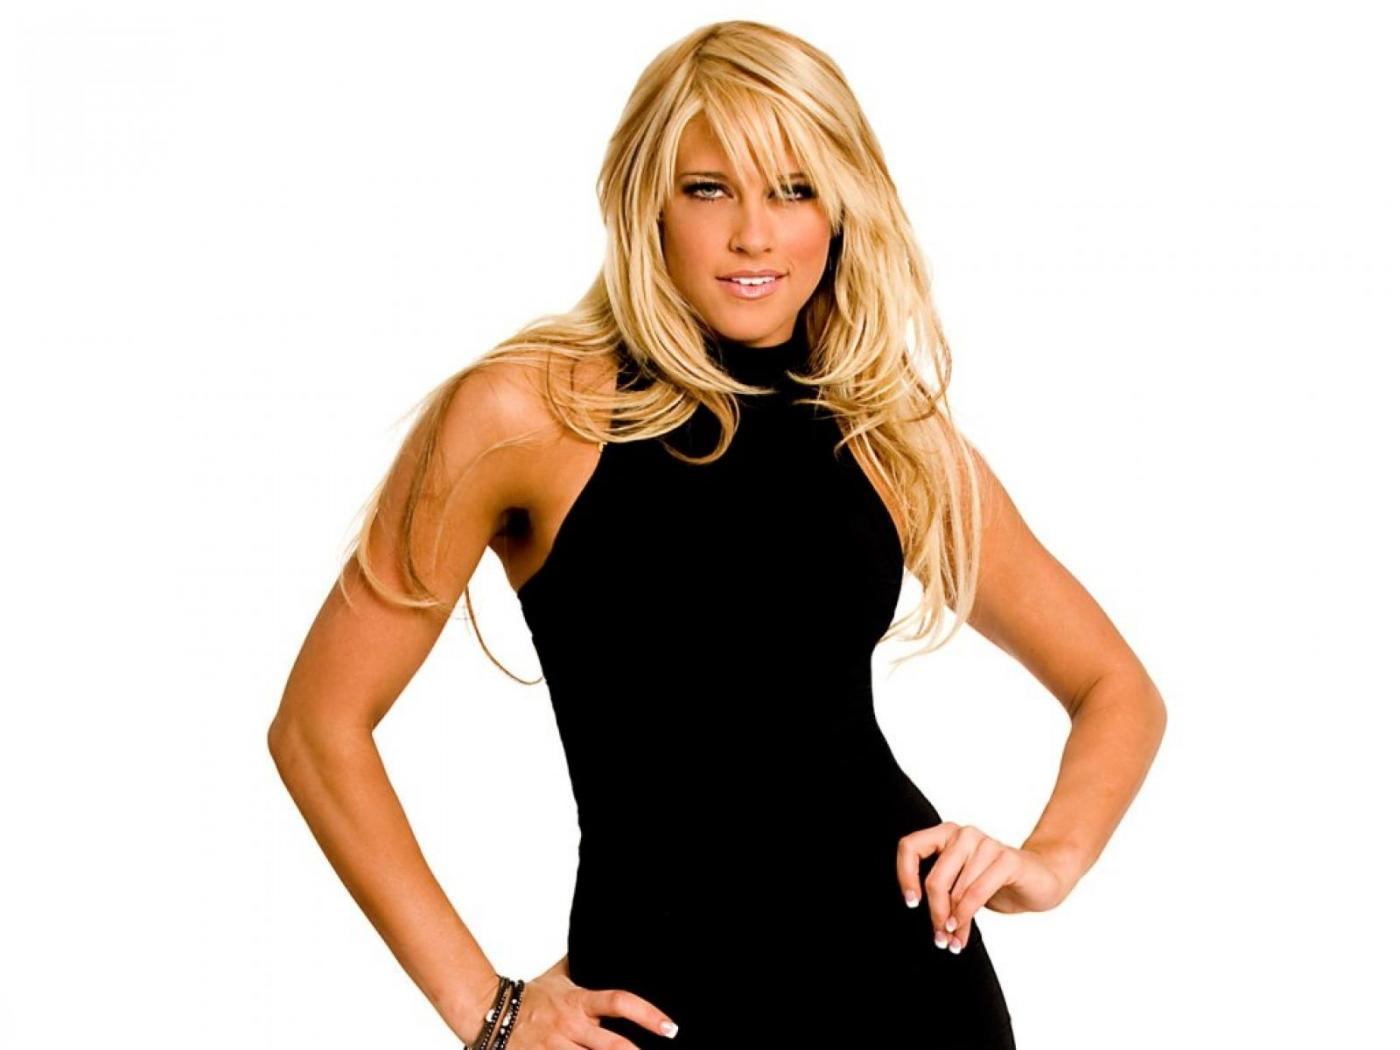 Kelly Kelly (WWE) naked (74 fotos), foto Paparazzi, iCloud, bra 2018